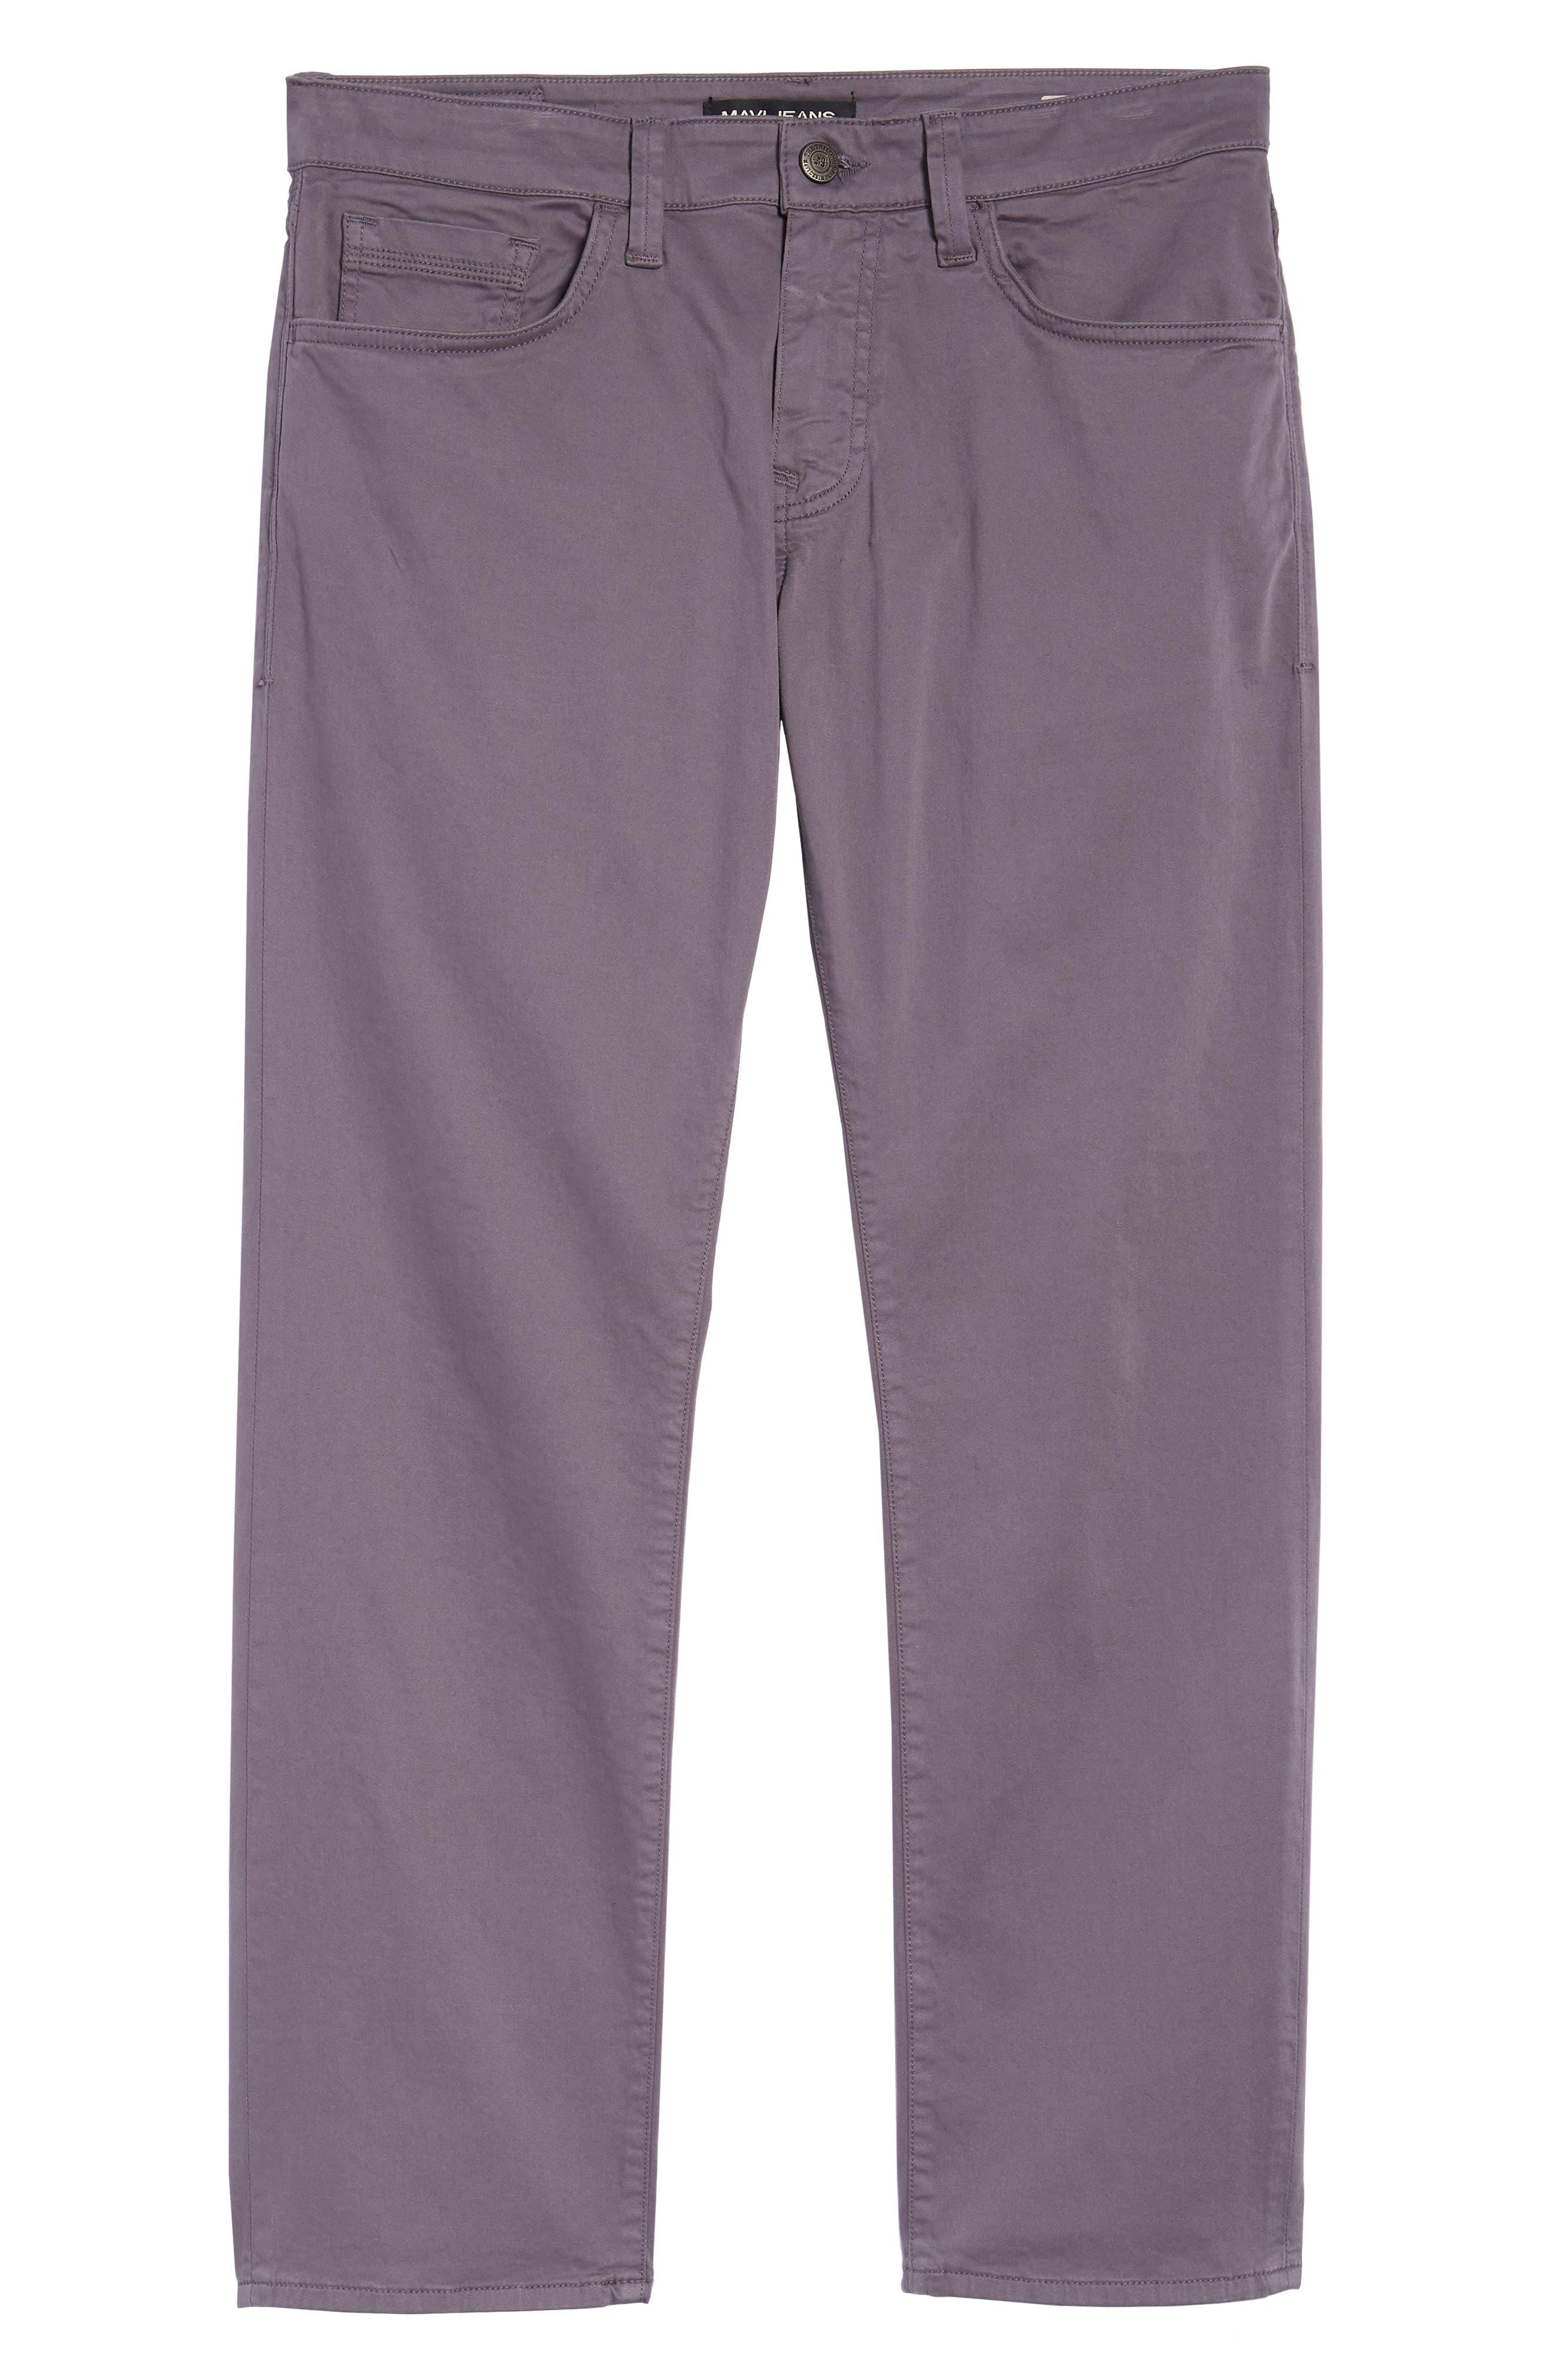 MAVI JEANS,                             Zach Straight Fit Twill Pants,                             Alternate thumbnail 6, color,                             050